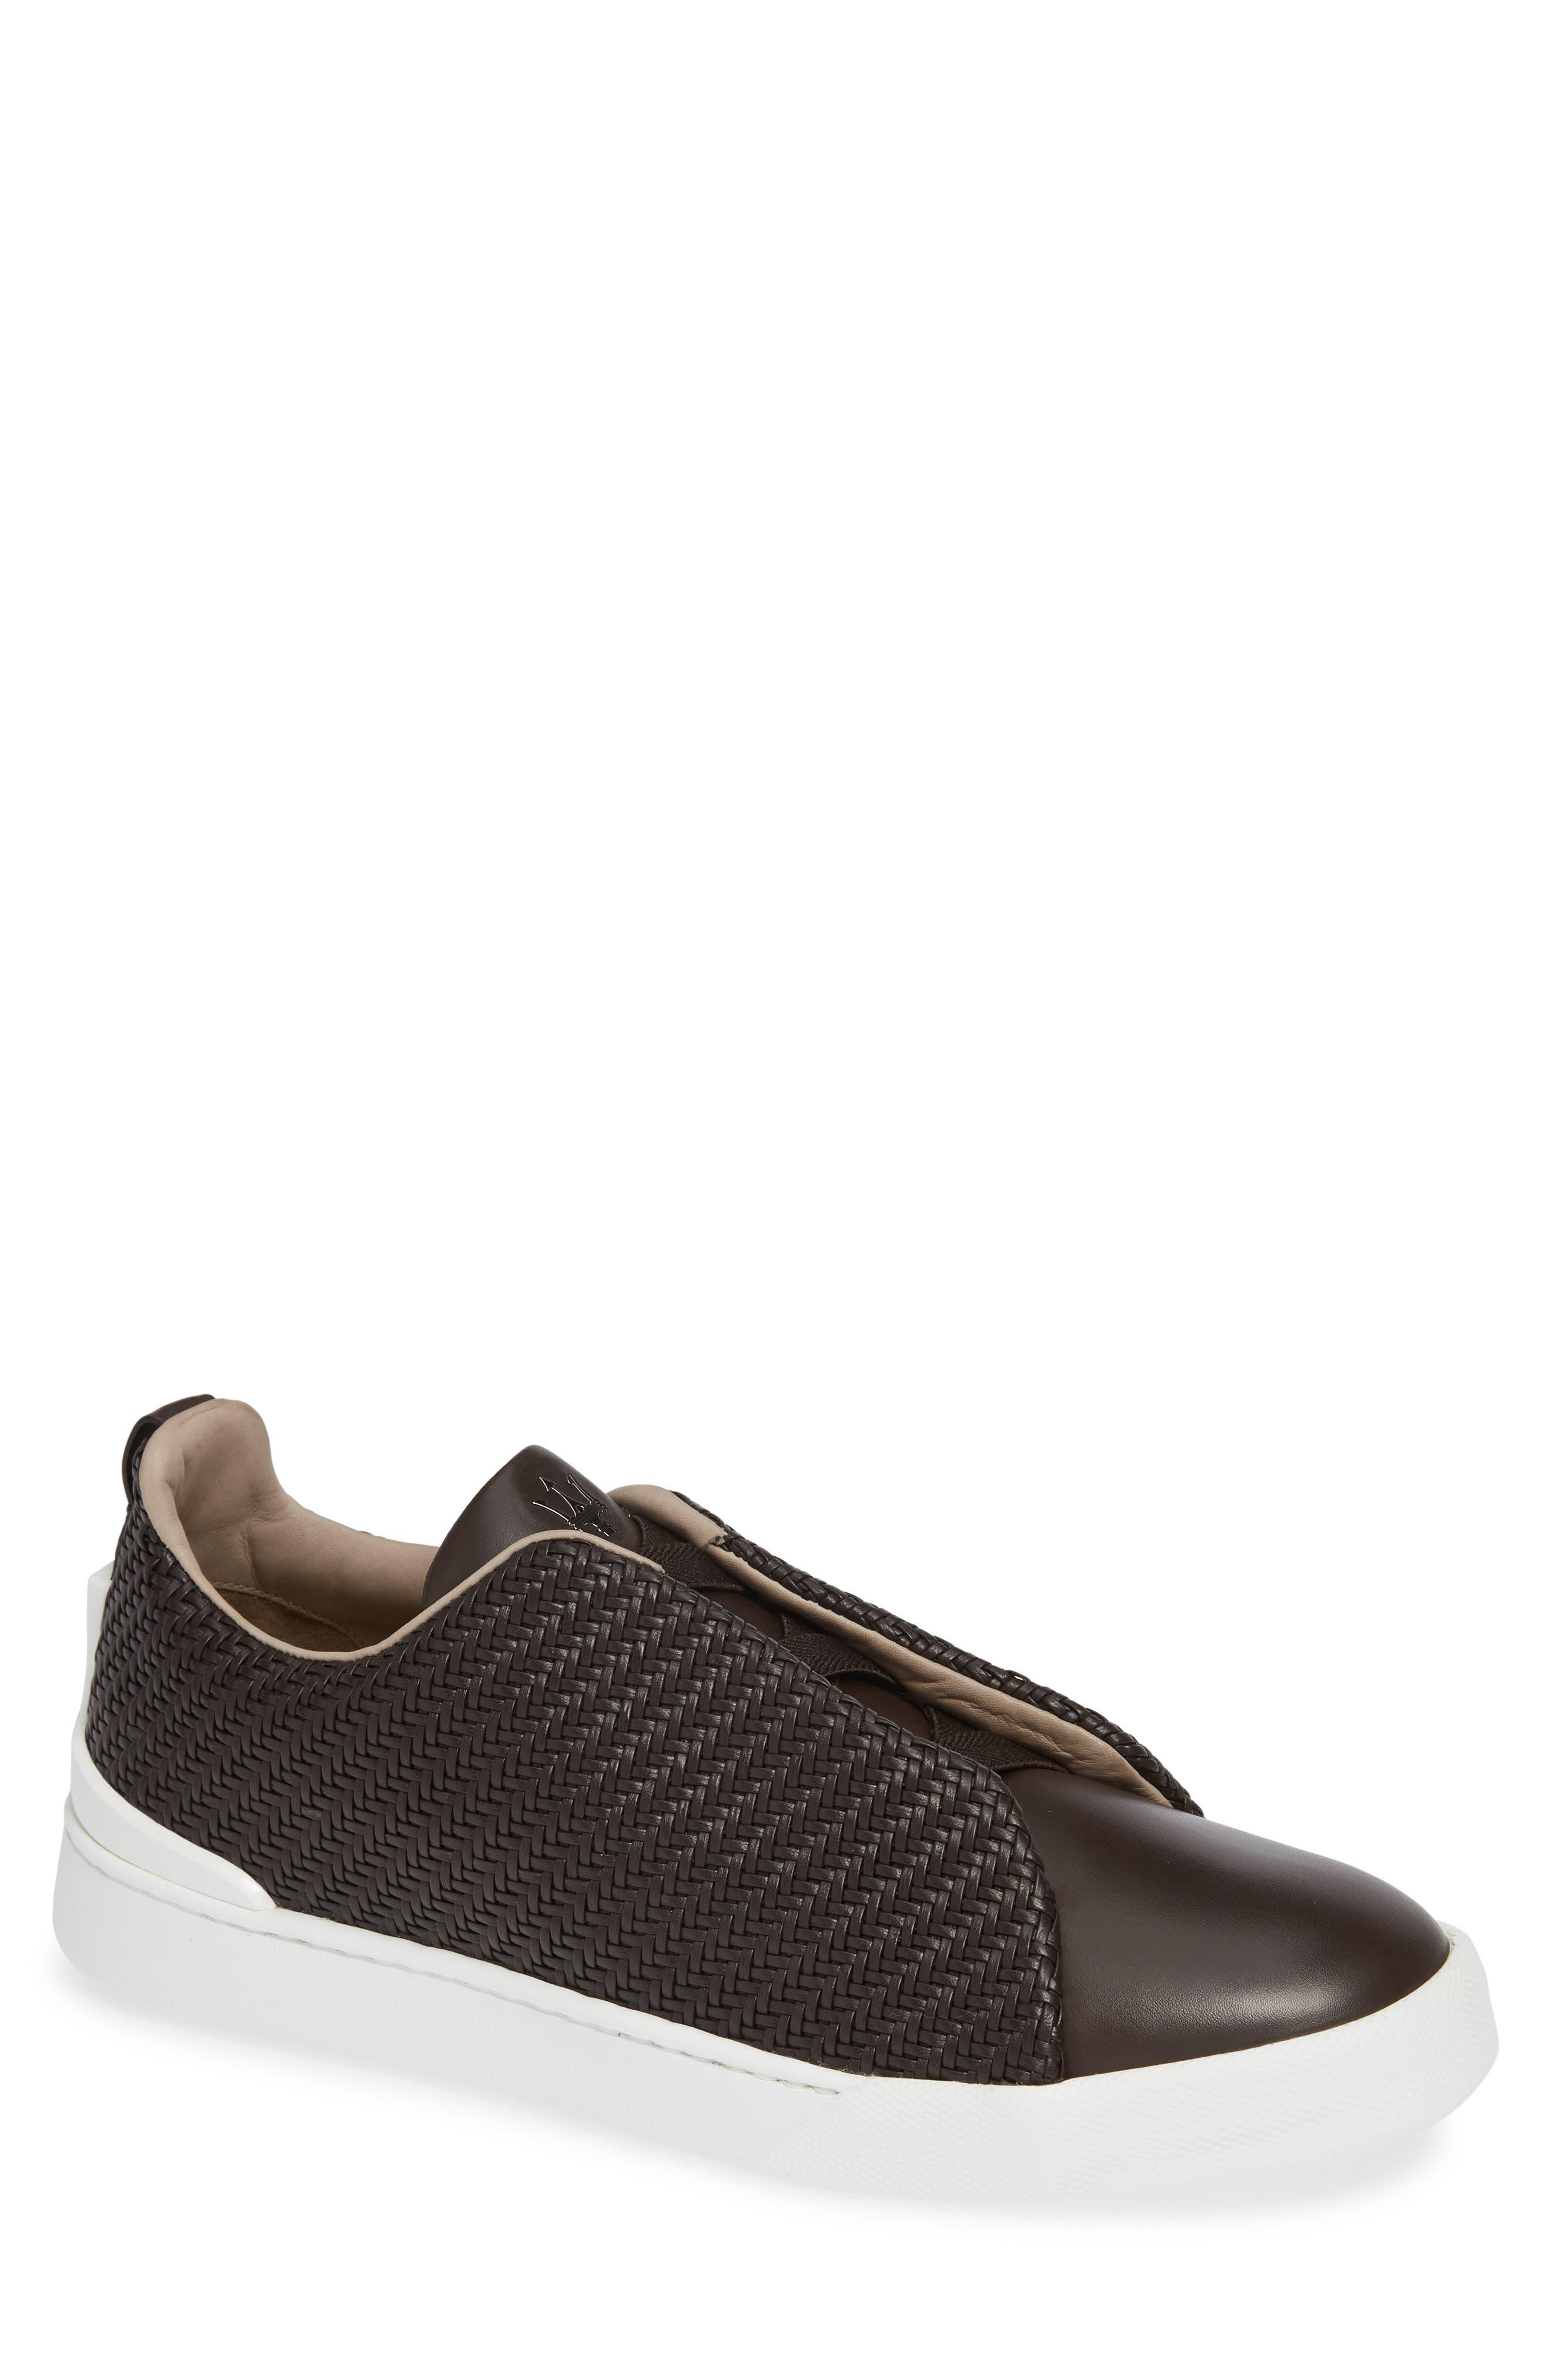 Slip-On Sneaker,                         Main,                         color, DARK BROWN